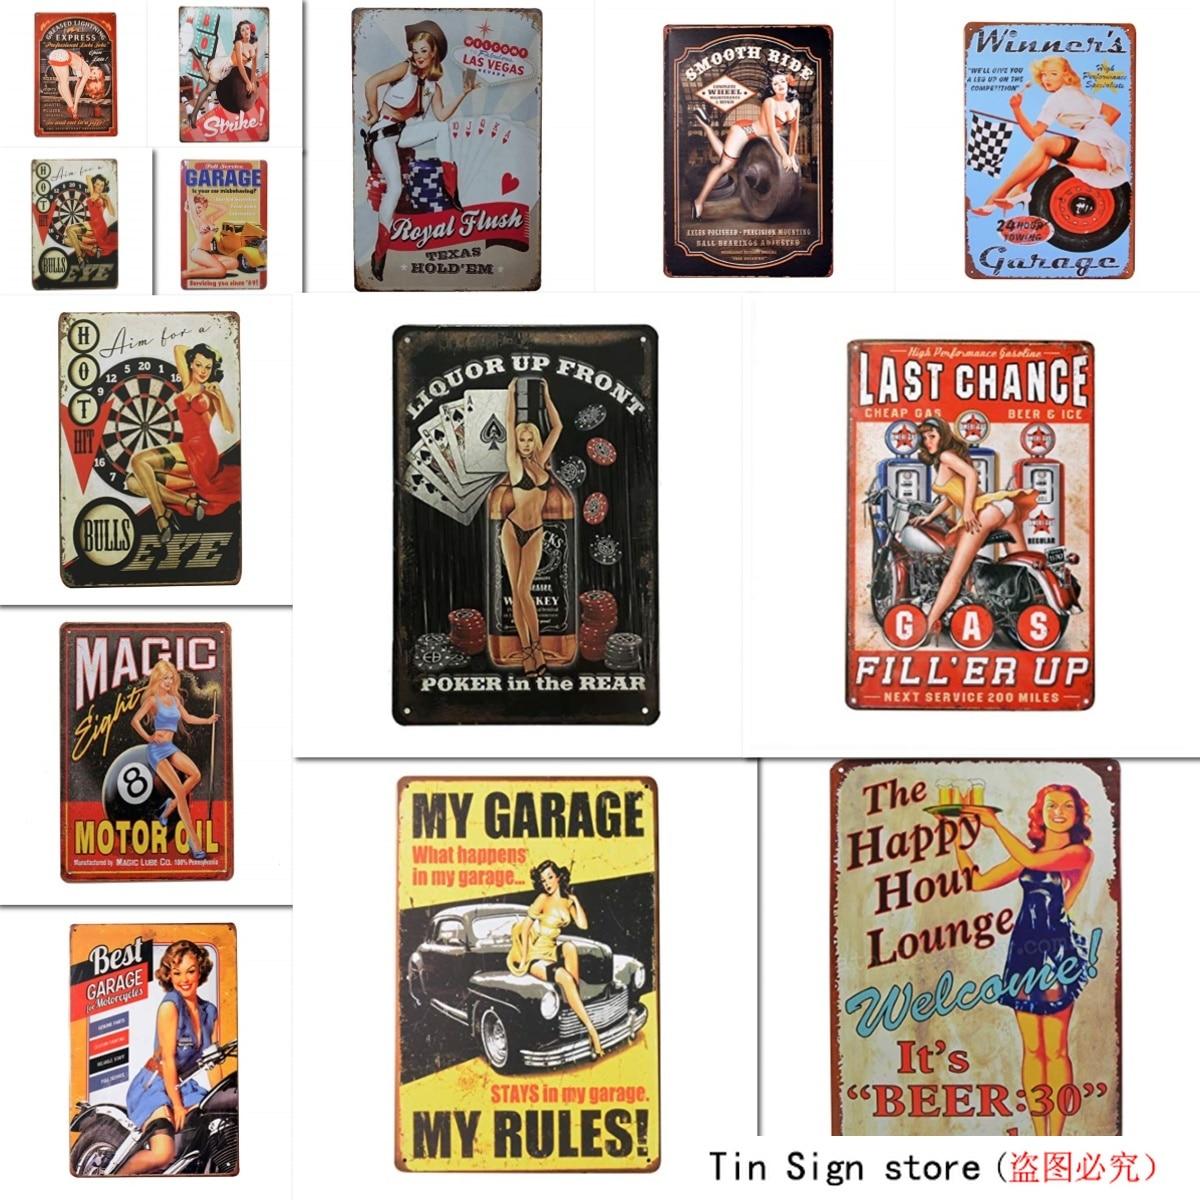 1st warehouse ретро Pin Up Sexy Girls Оловянная металлическая табличка, настенный Декор для дома Garage Man Cave Bar, 8x12 дюймов/20x30 см (Bull's Eye)